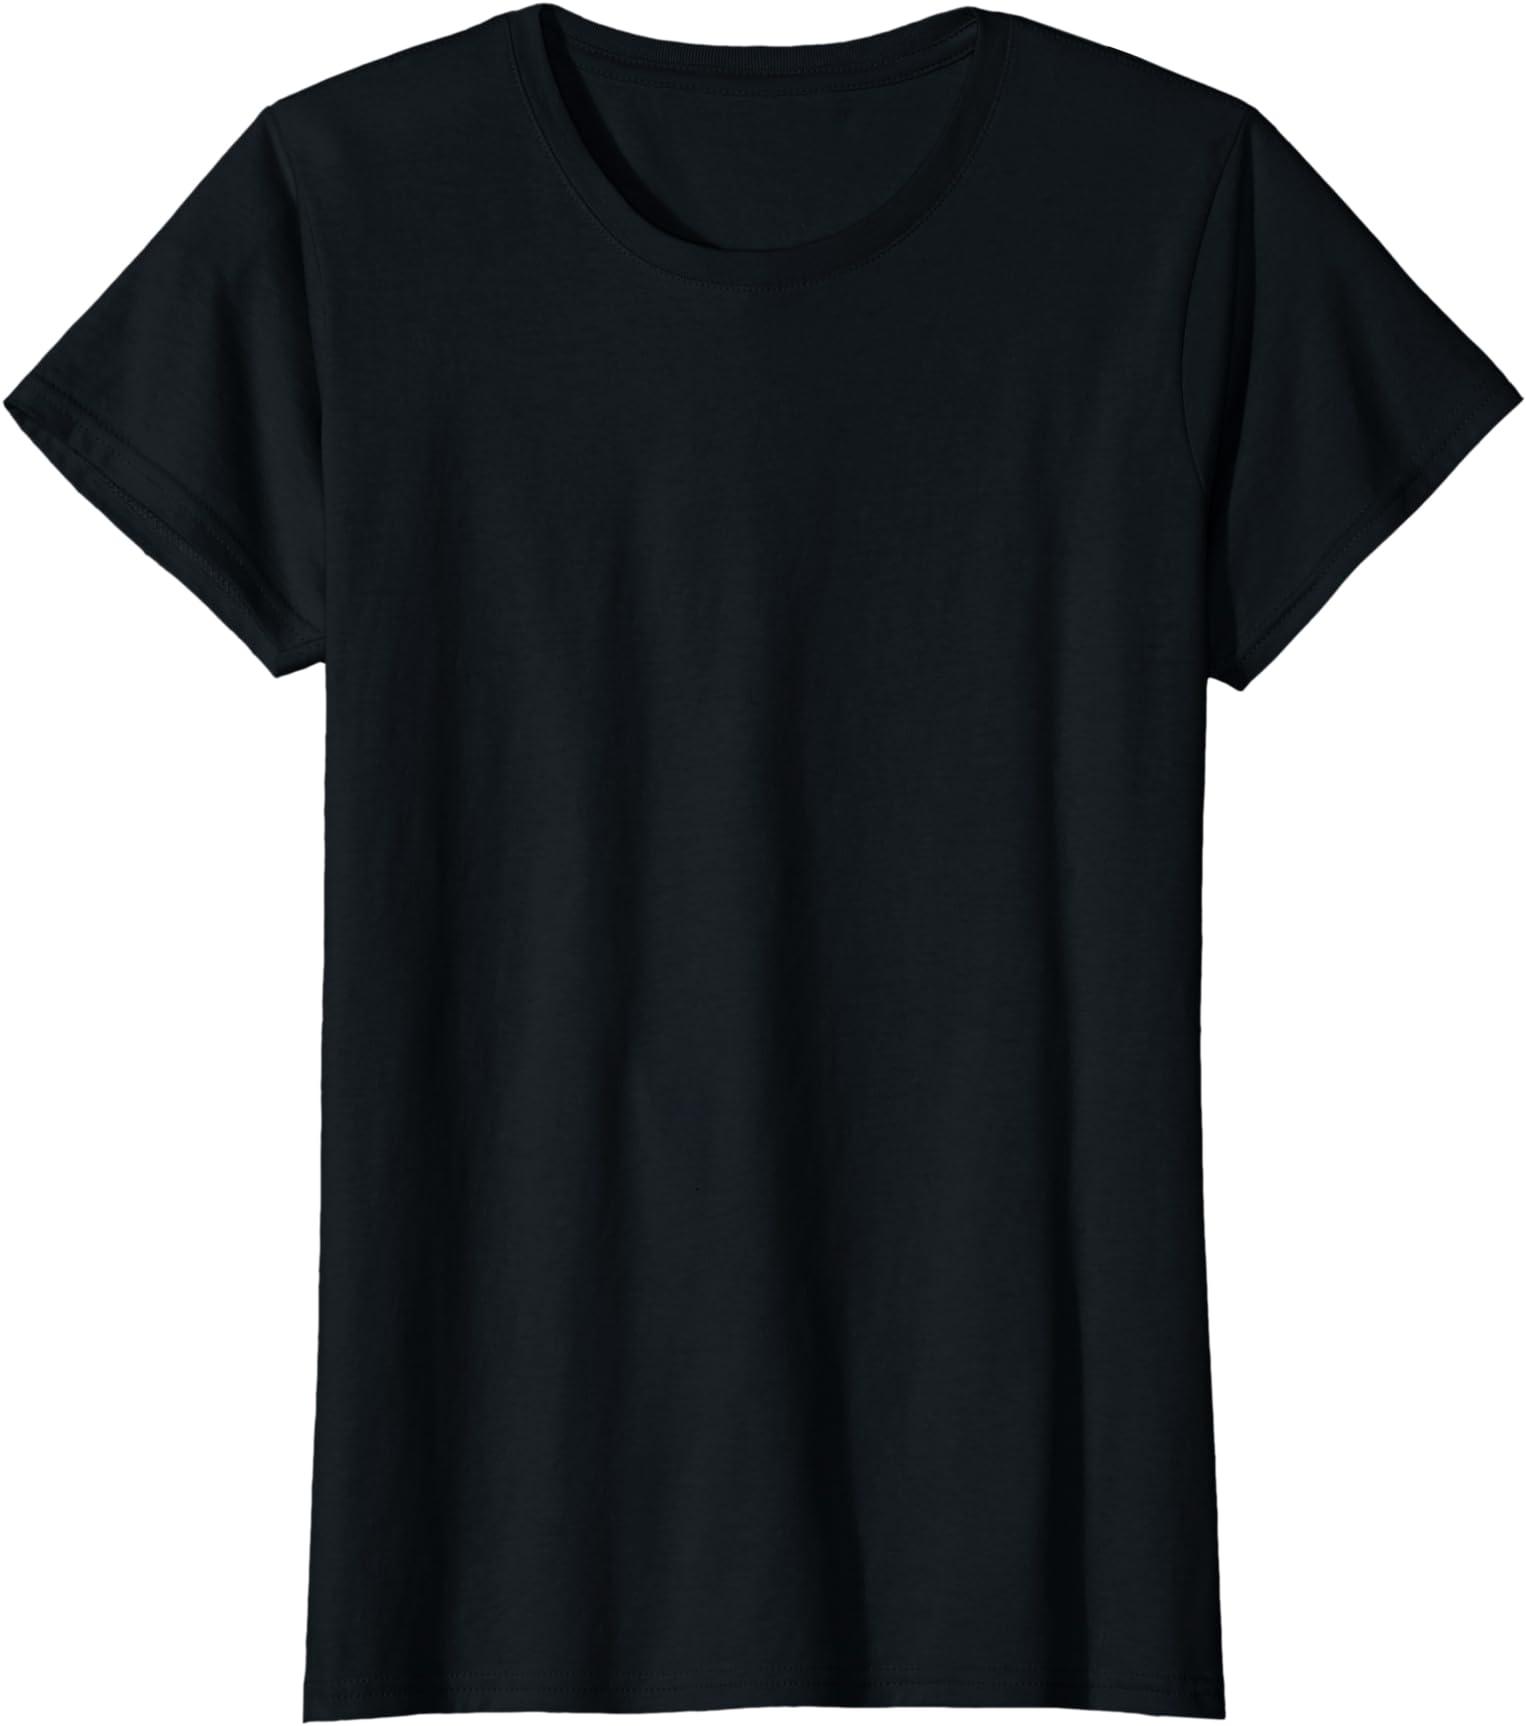 Born In March Ziloda Tees English Man Unisex Shirt